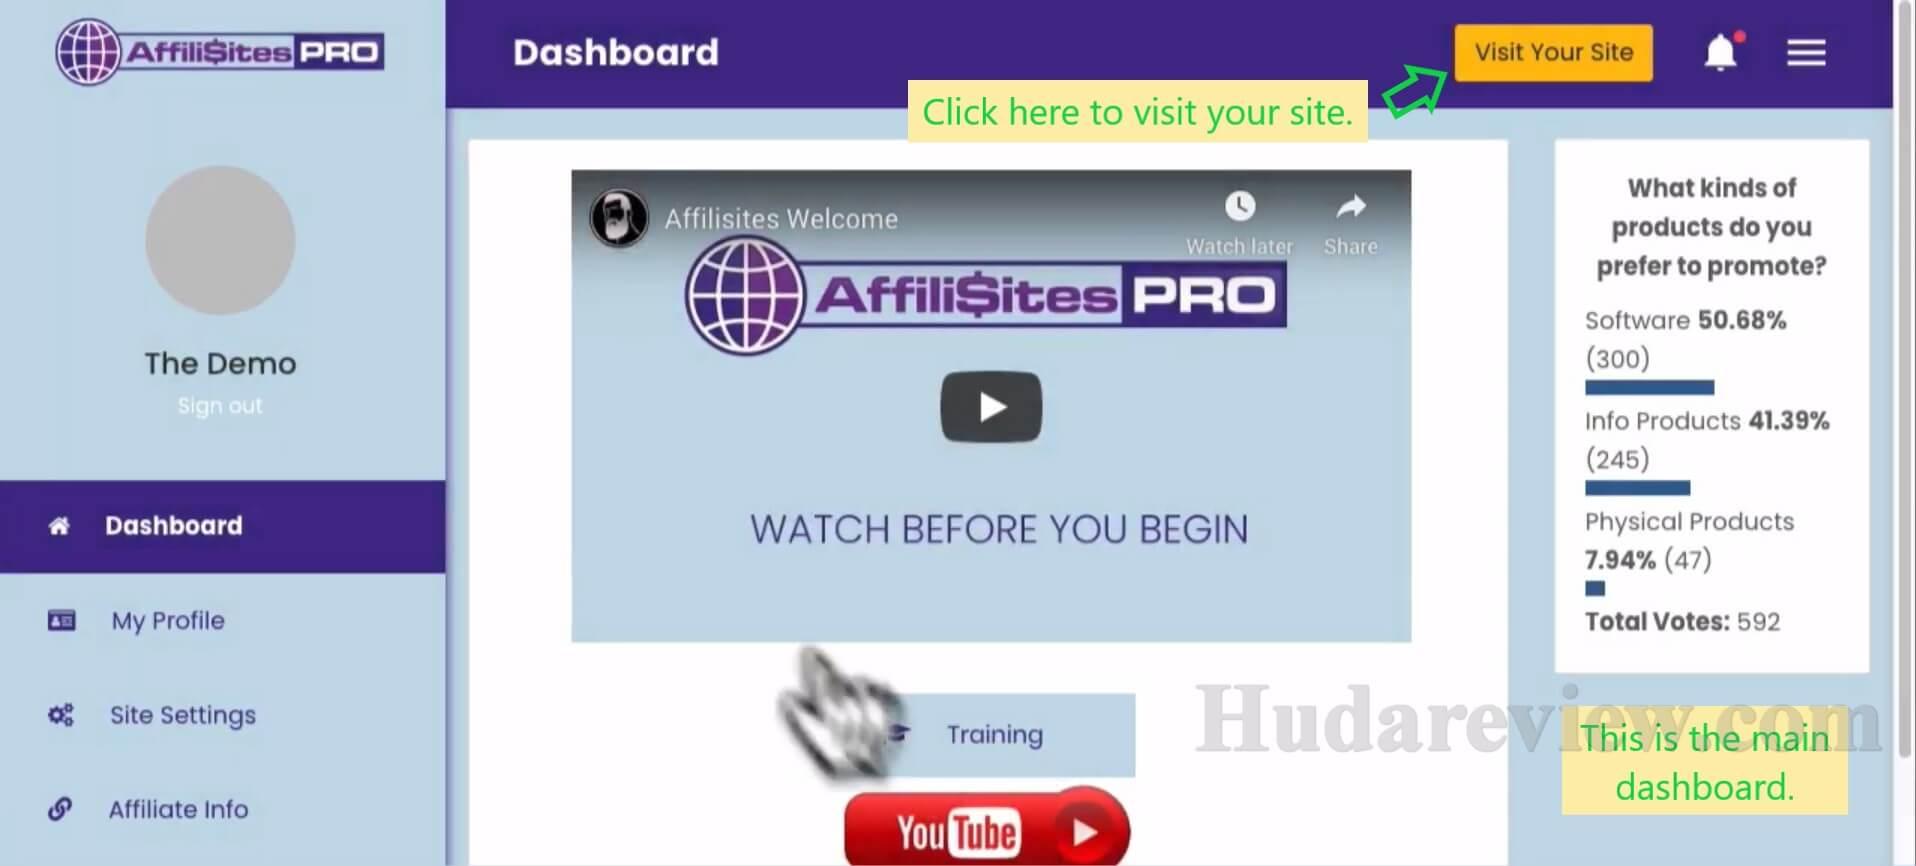 AffiliSites-PRO-Step-1-1